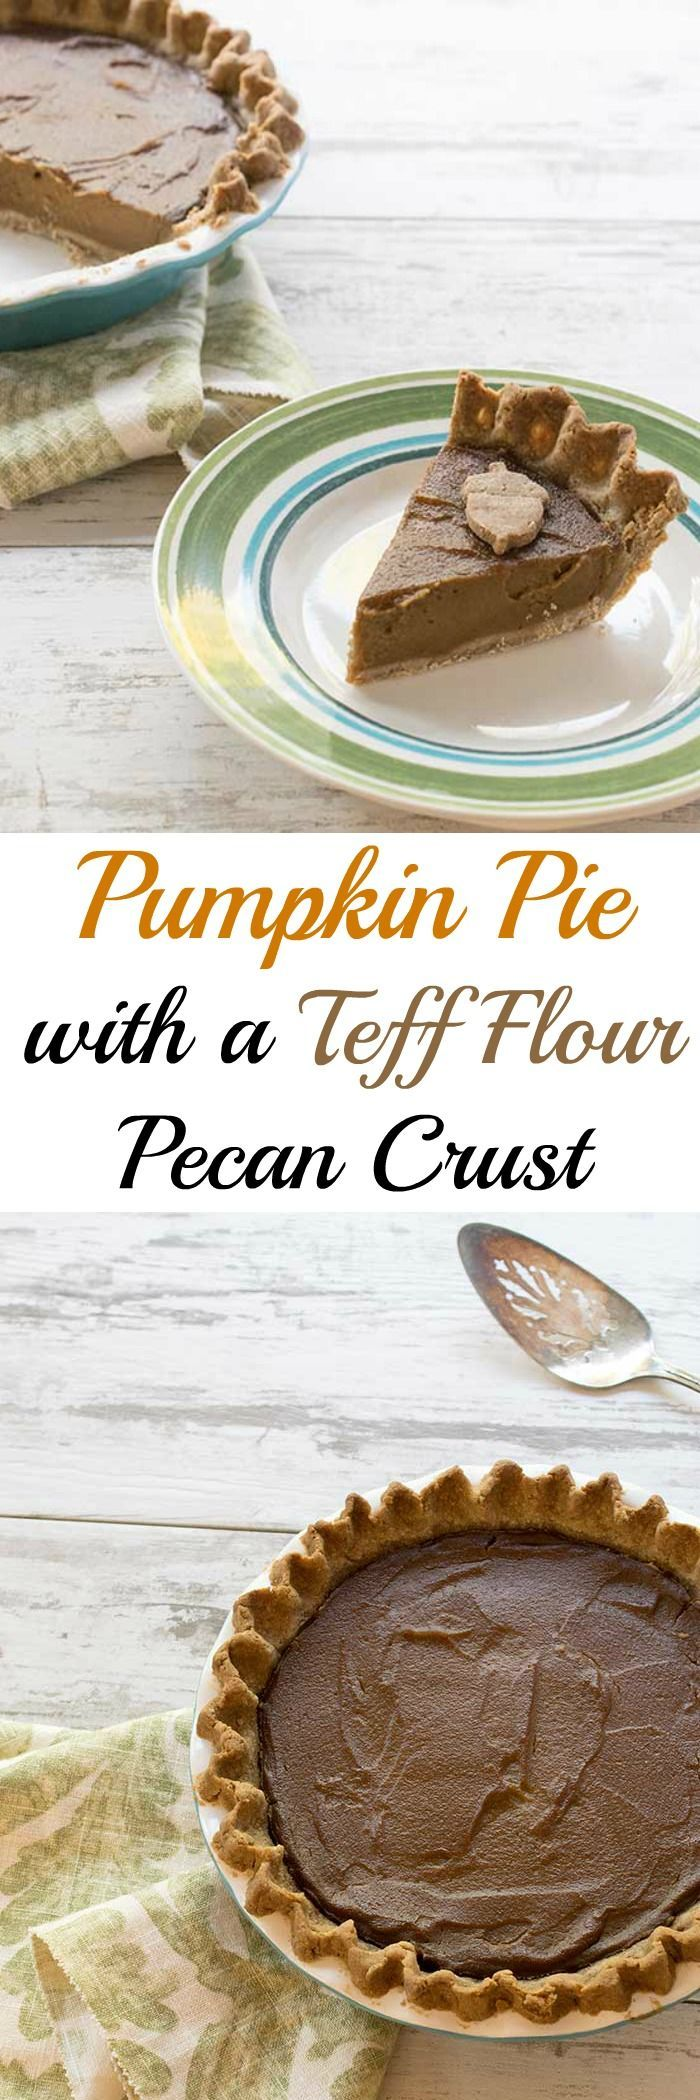 Gluten Free Vegan Pumpkin Pie With A Teff Flour Pecan Crust Recipe Vegan Dessert Recipes Vegan Pumpkin Pie Vegan Holiday Recipes